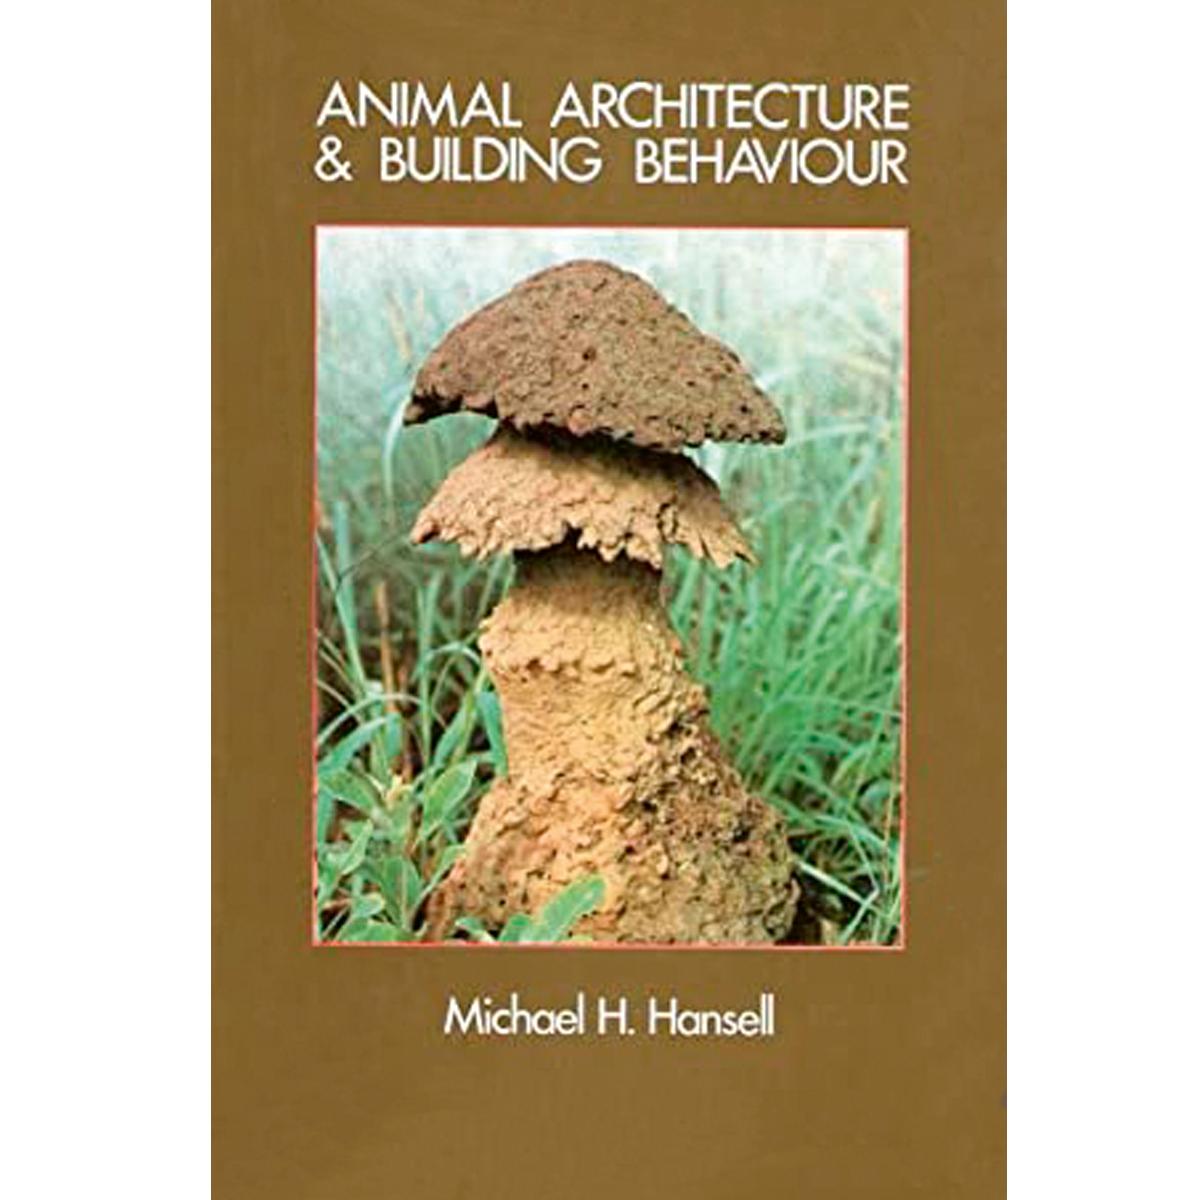 Animal Architecture and Building Behaviour